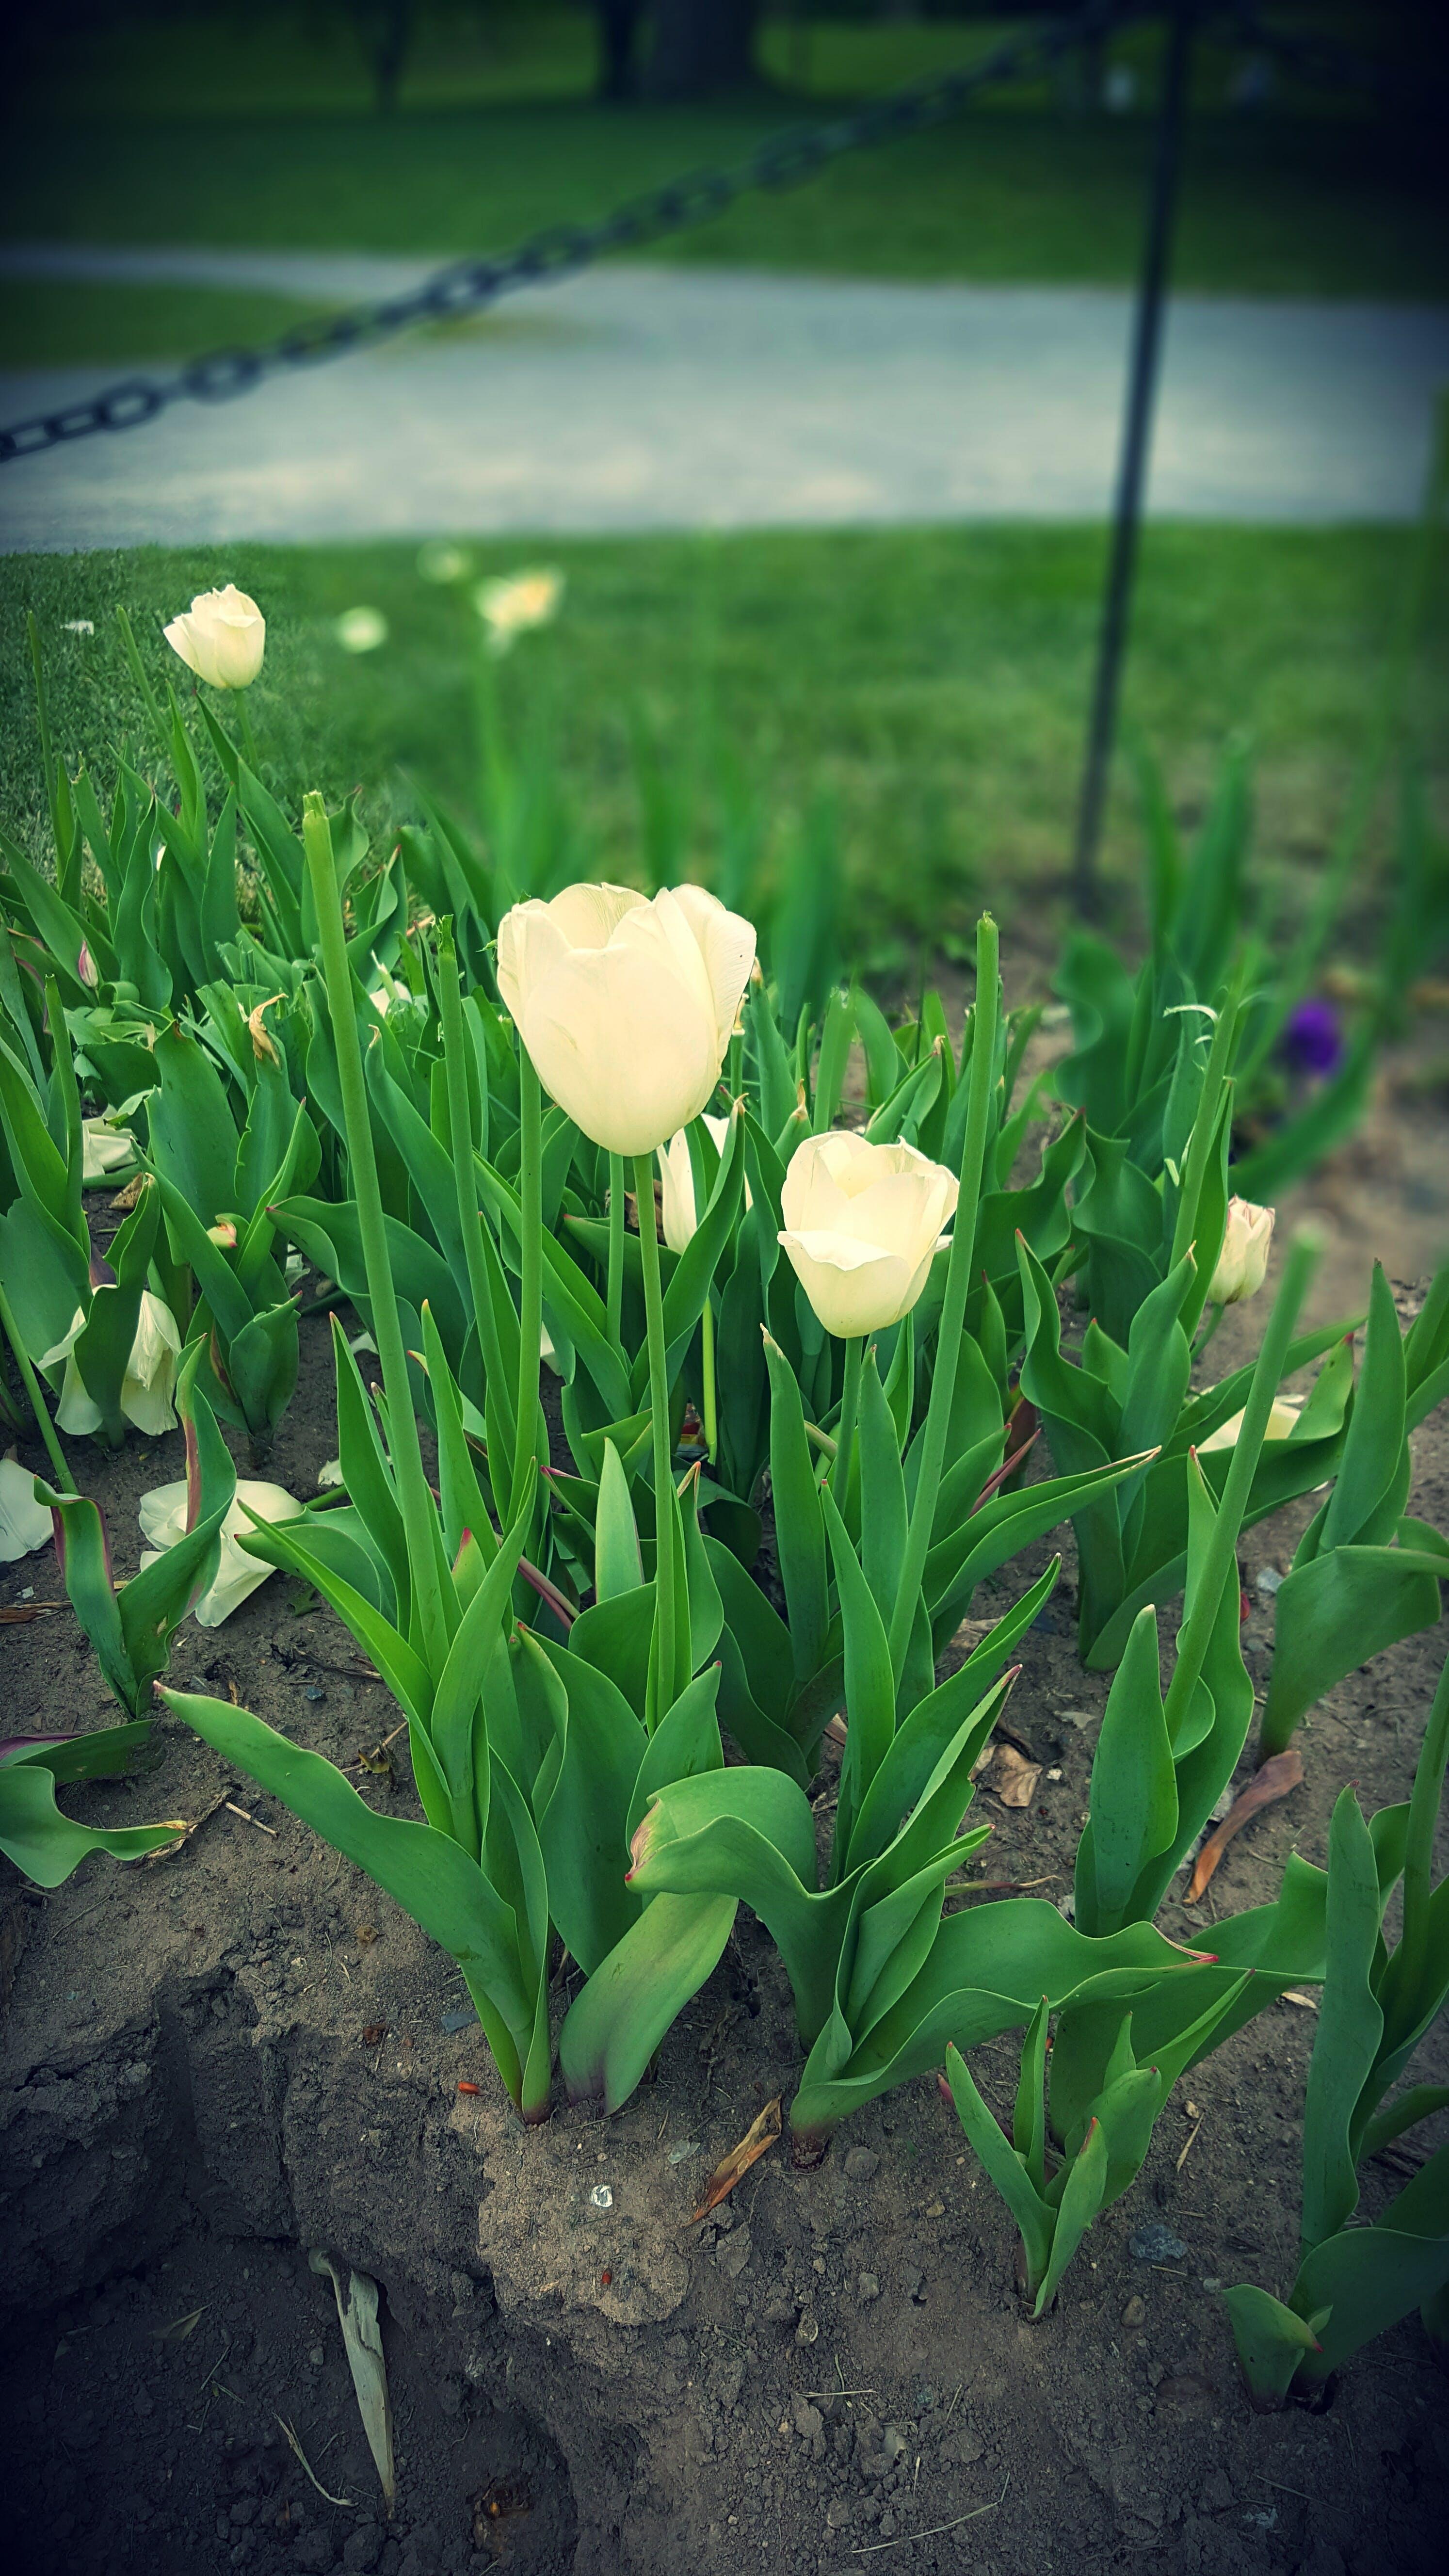 White Petal Flowers during Daytime